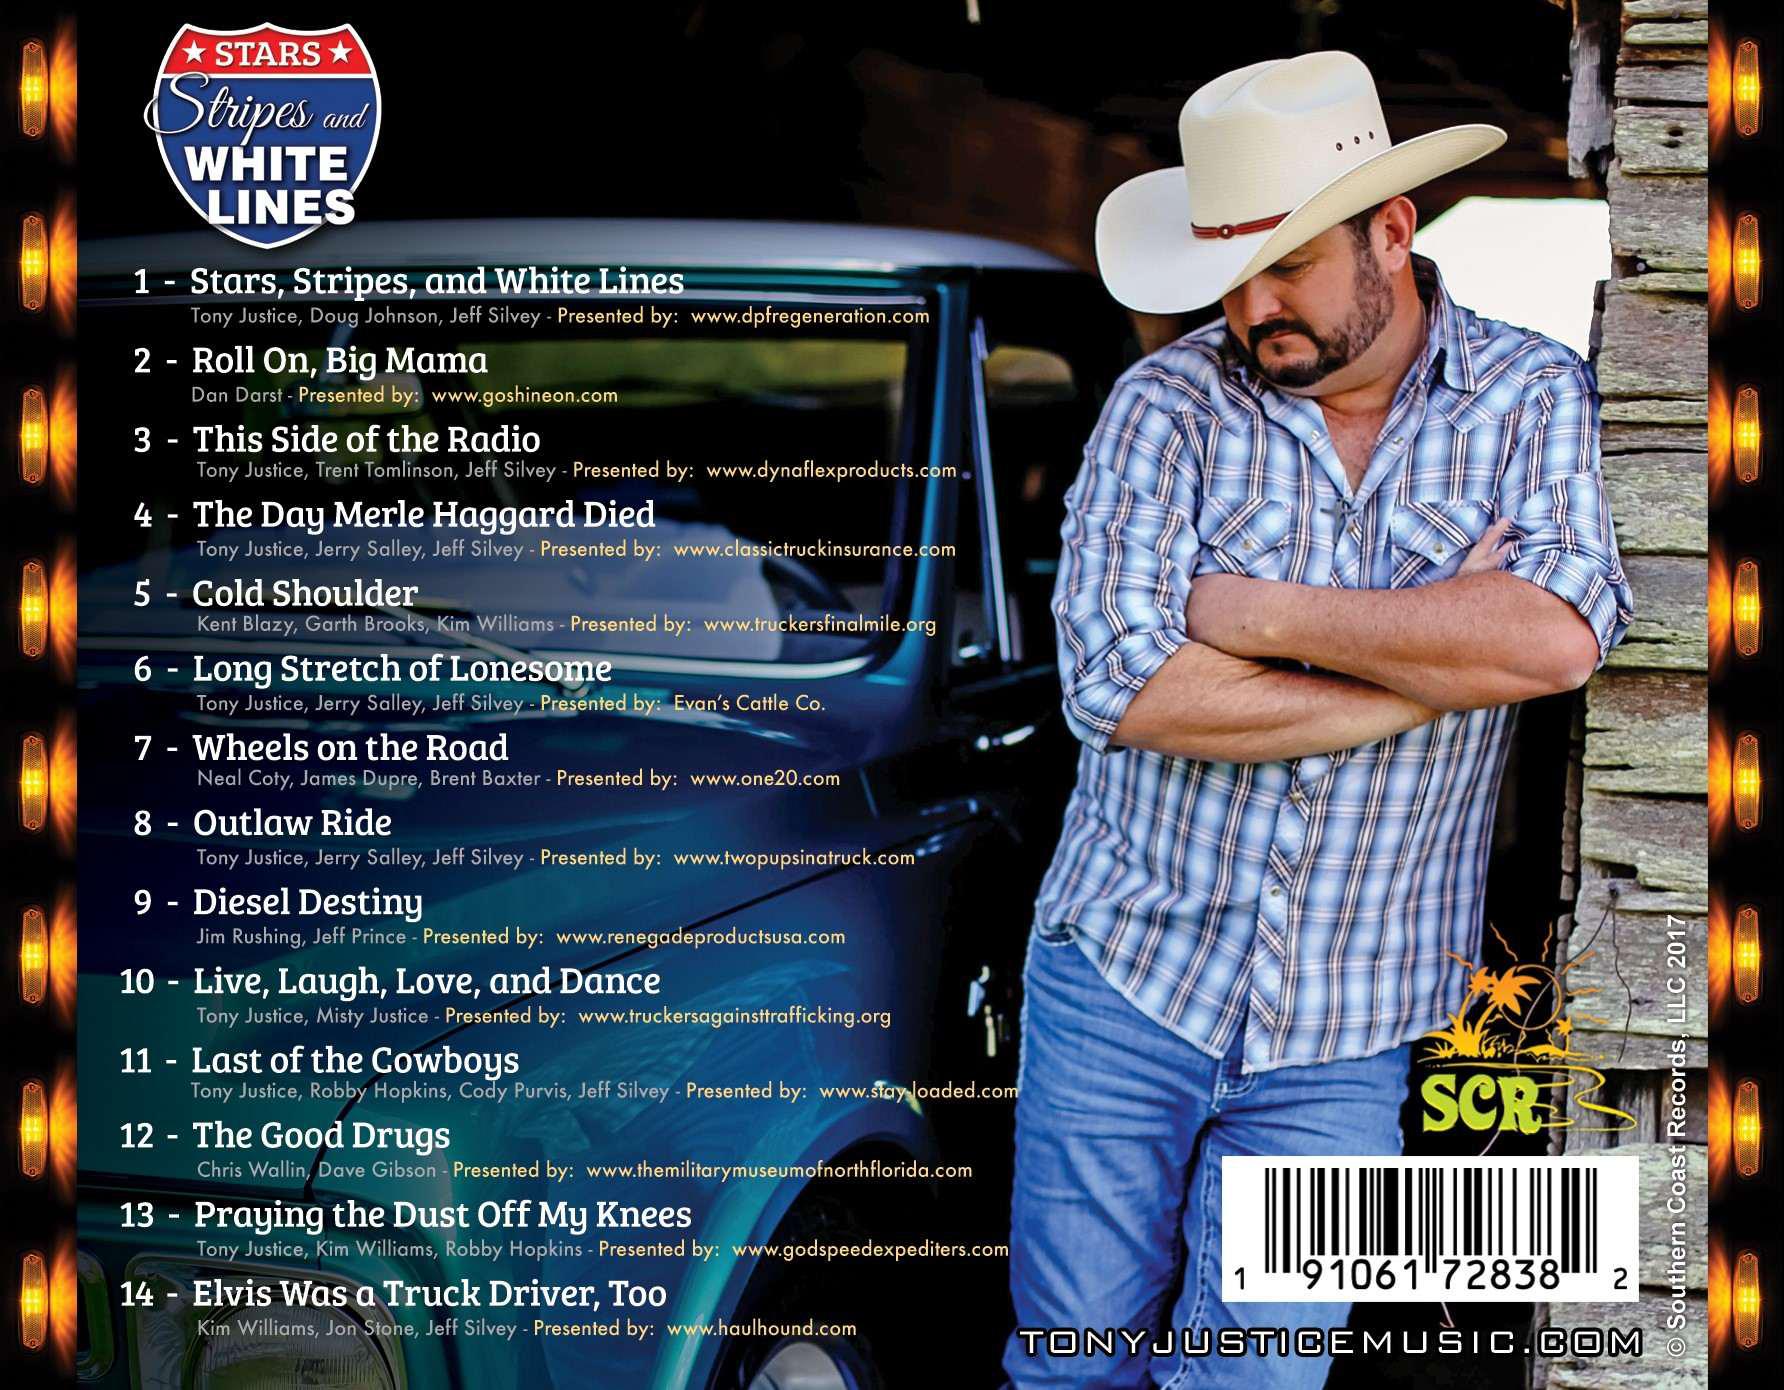 Ta Petro Com >> Audio tour through Tony Justice's new 'Stars, Stripes and ...